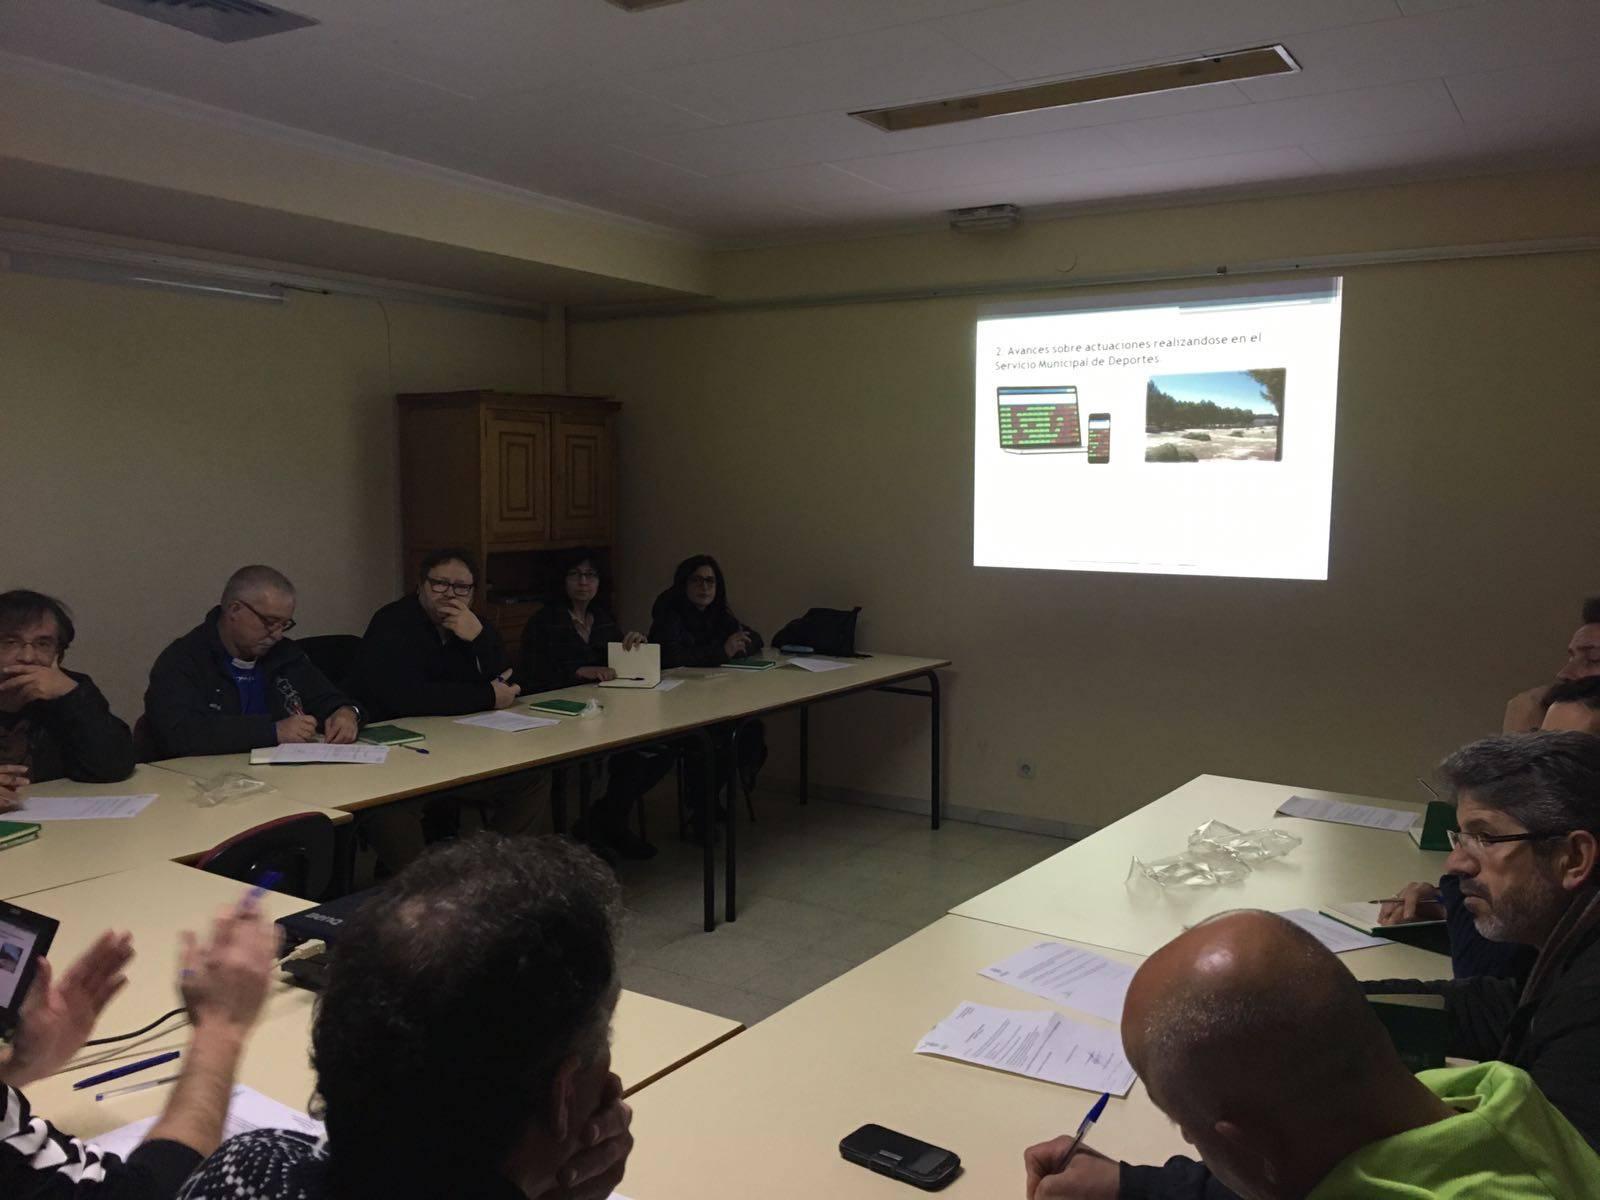 reunion consejo local deporte herencia - Celebrado el Consejo Local del Deporte en Herencia